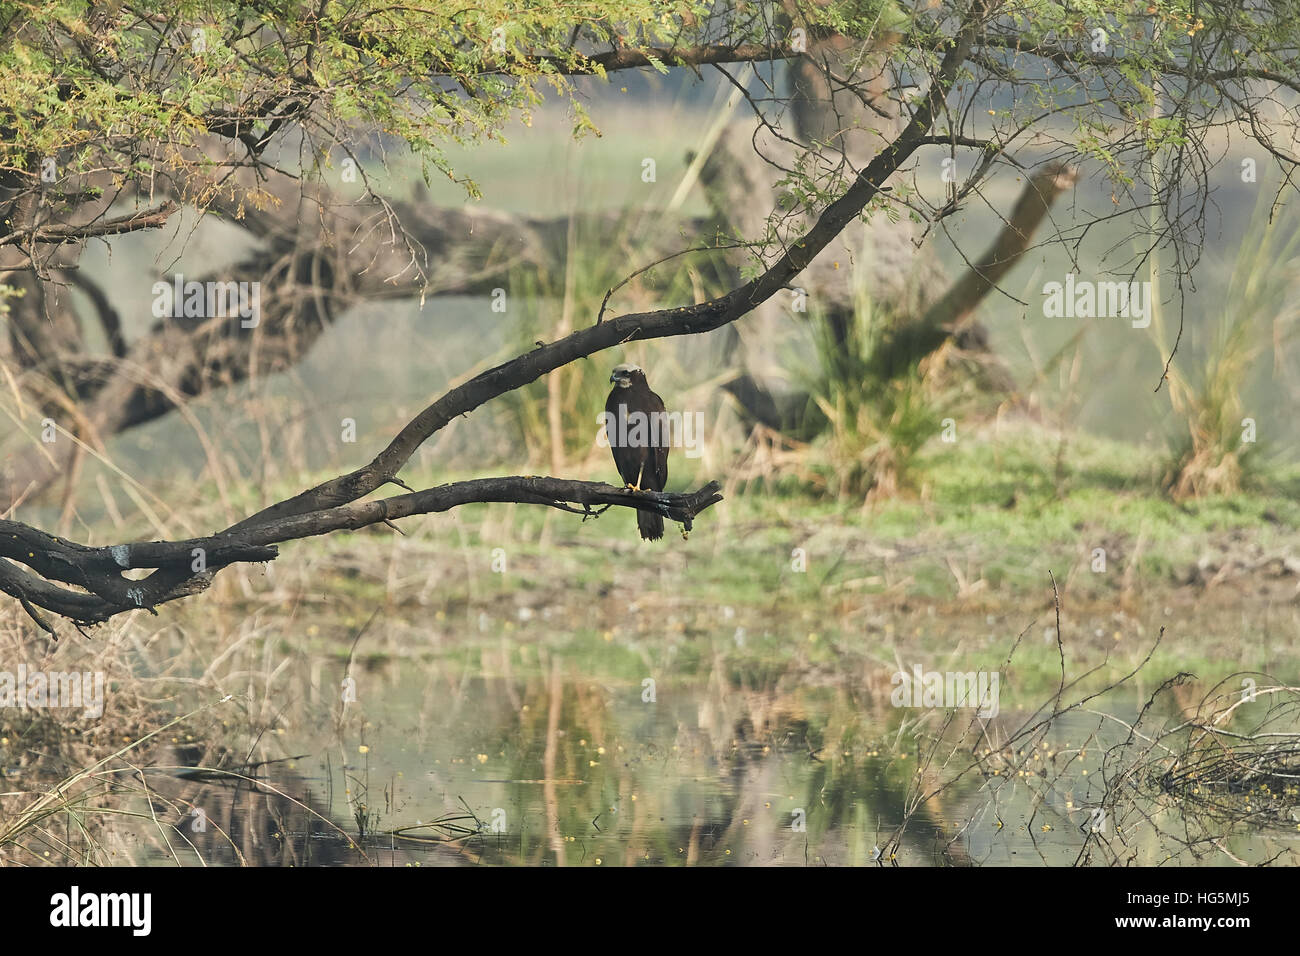 Western marsh harrier (Circus aeruginosus), also known as the Eurasian marsh harrier. Wild life animal. - Stock Image